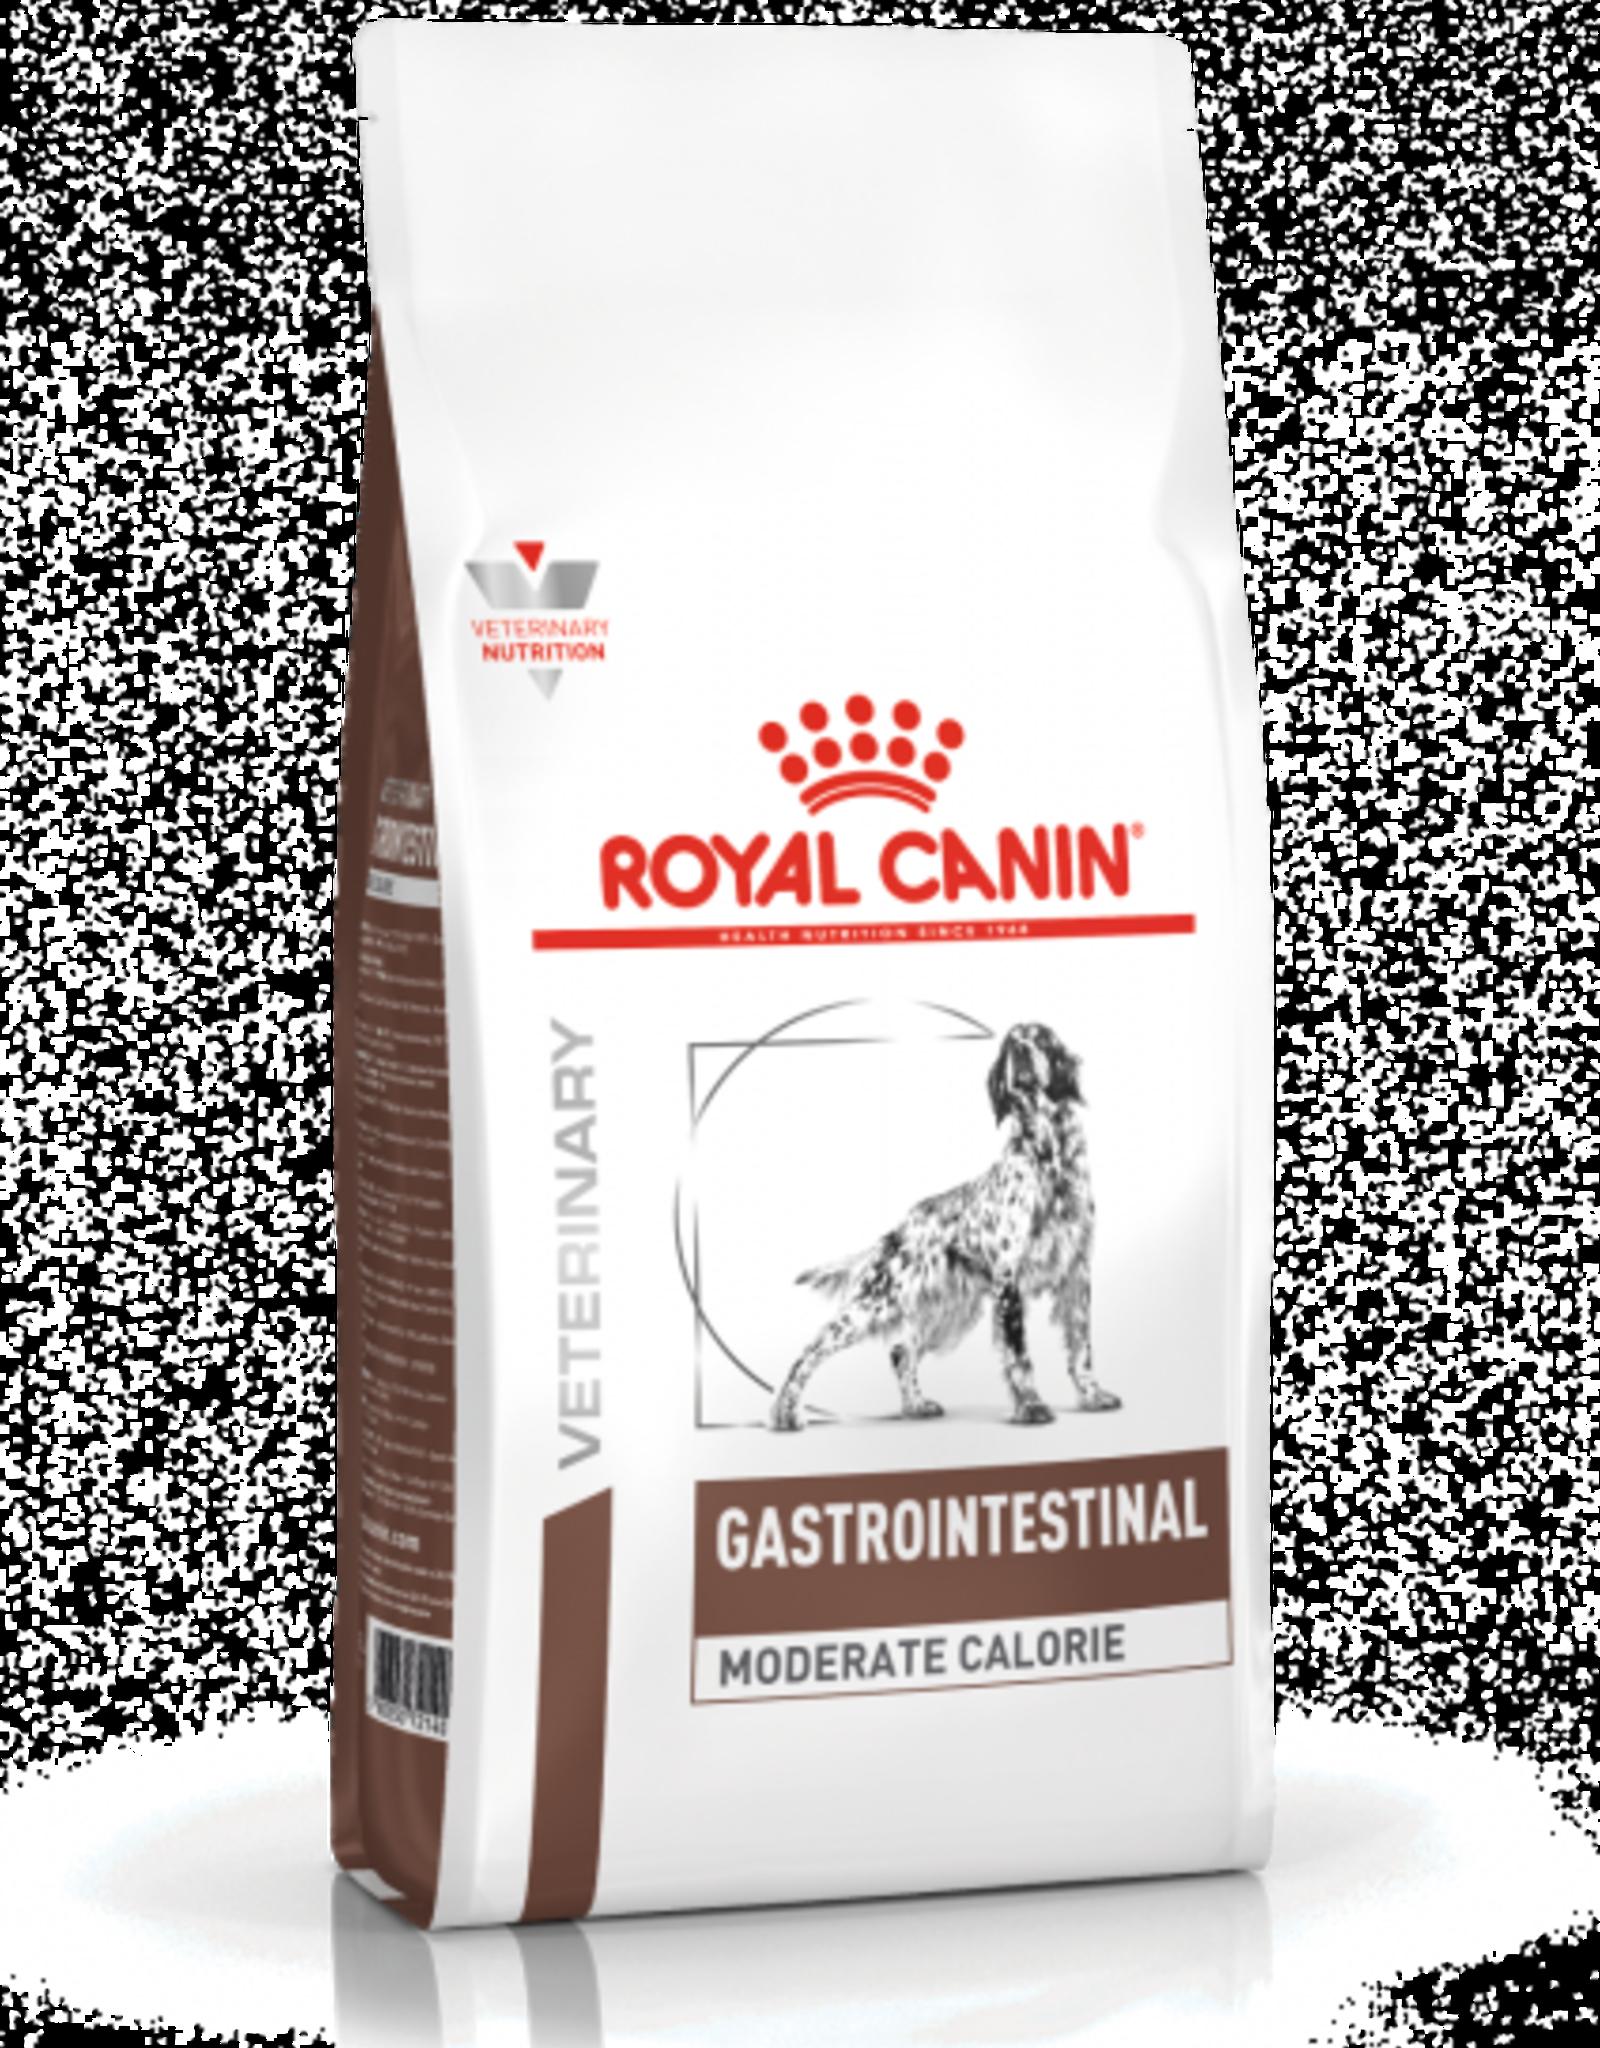 Royal Canin Royal Canin Gastro Intestinal Mod Cal Chien 7,5kg